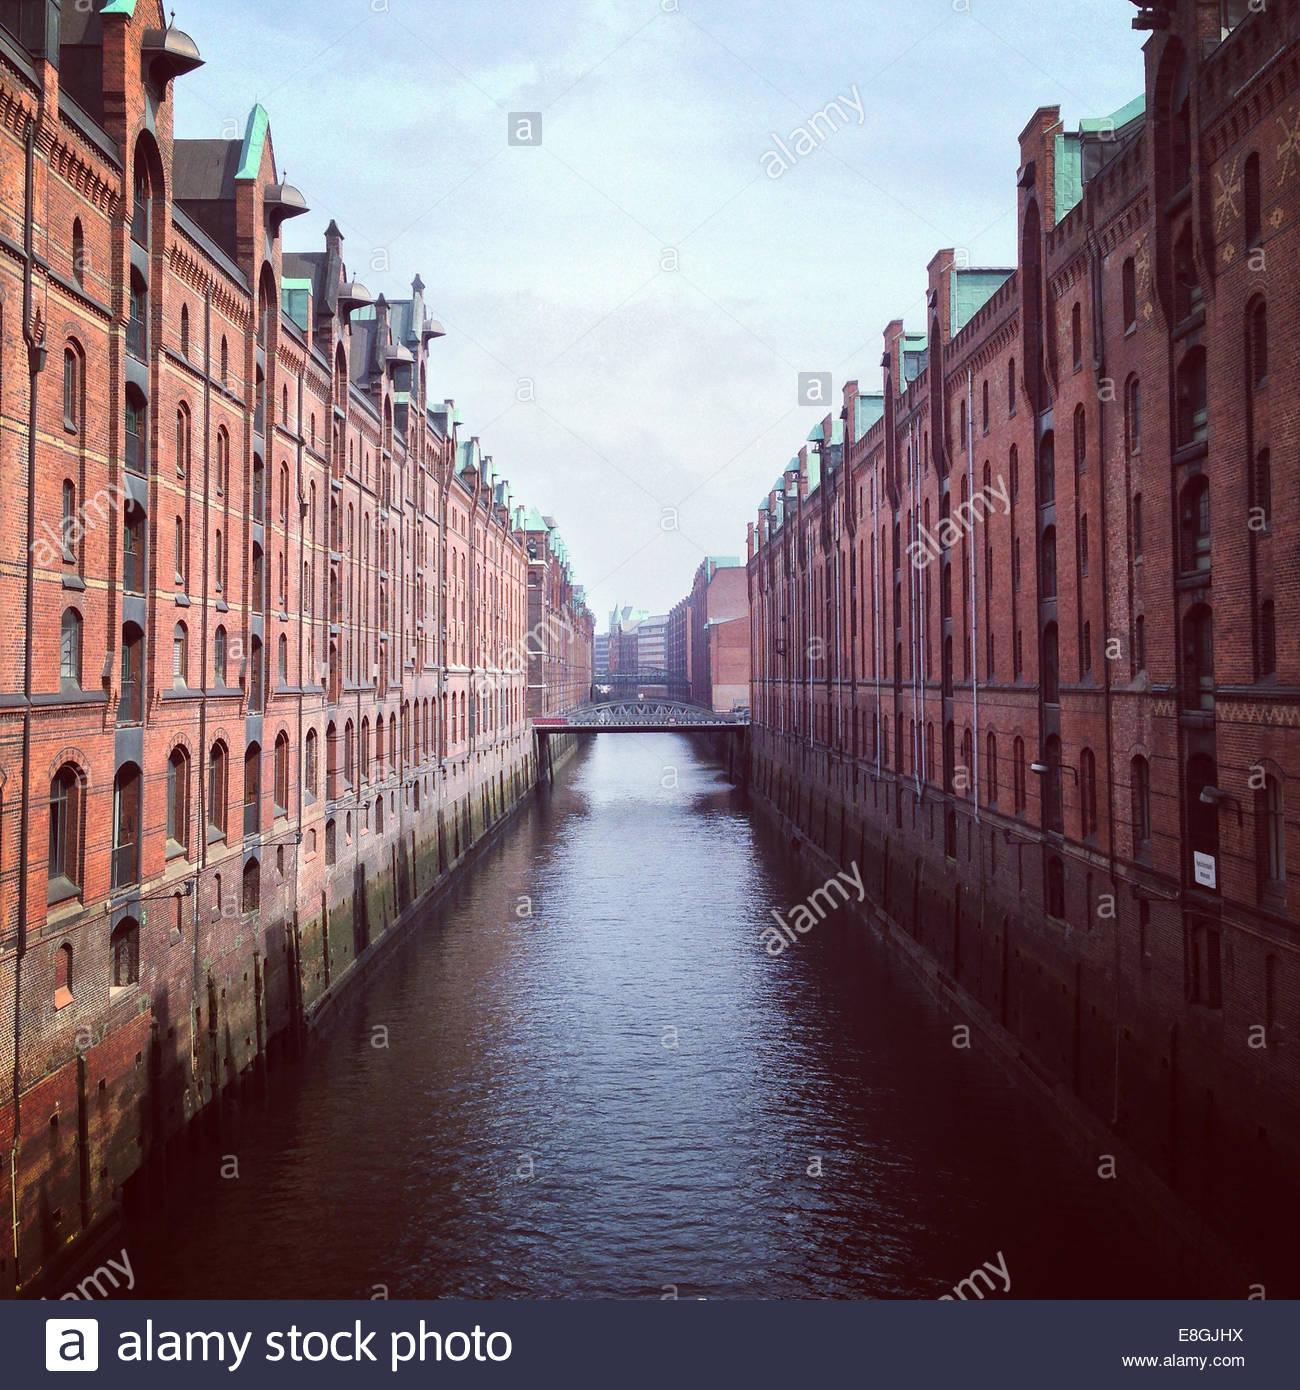 Canal between buildings, Hamburg, Germany - Stock Image